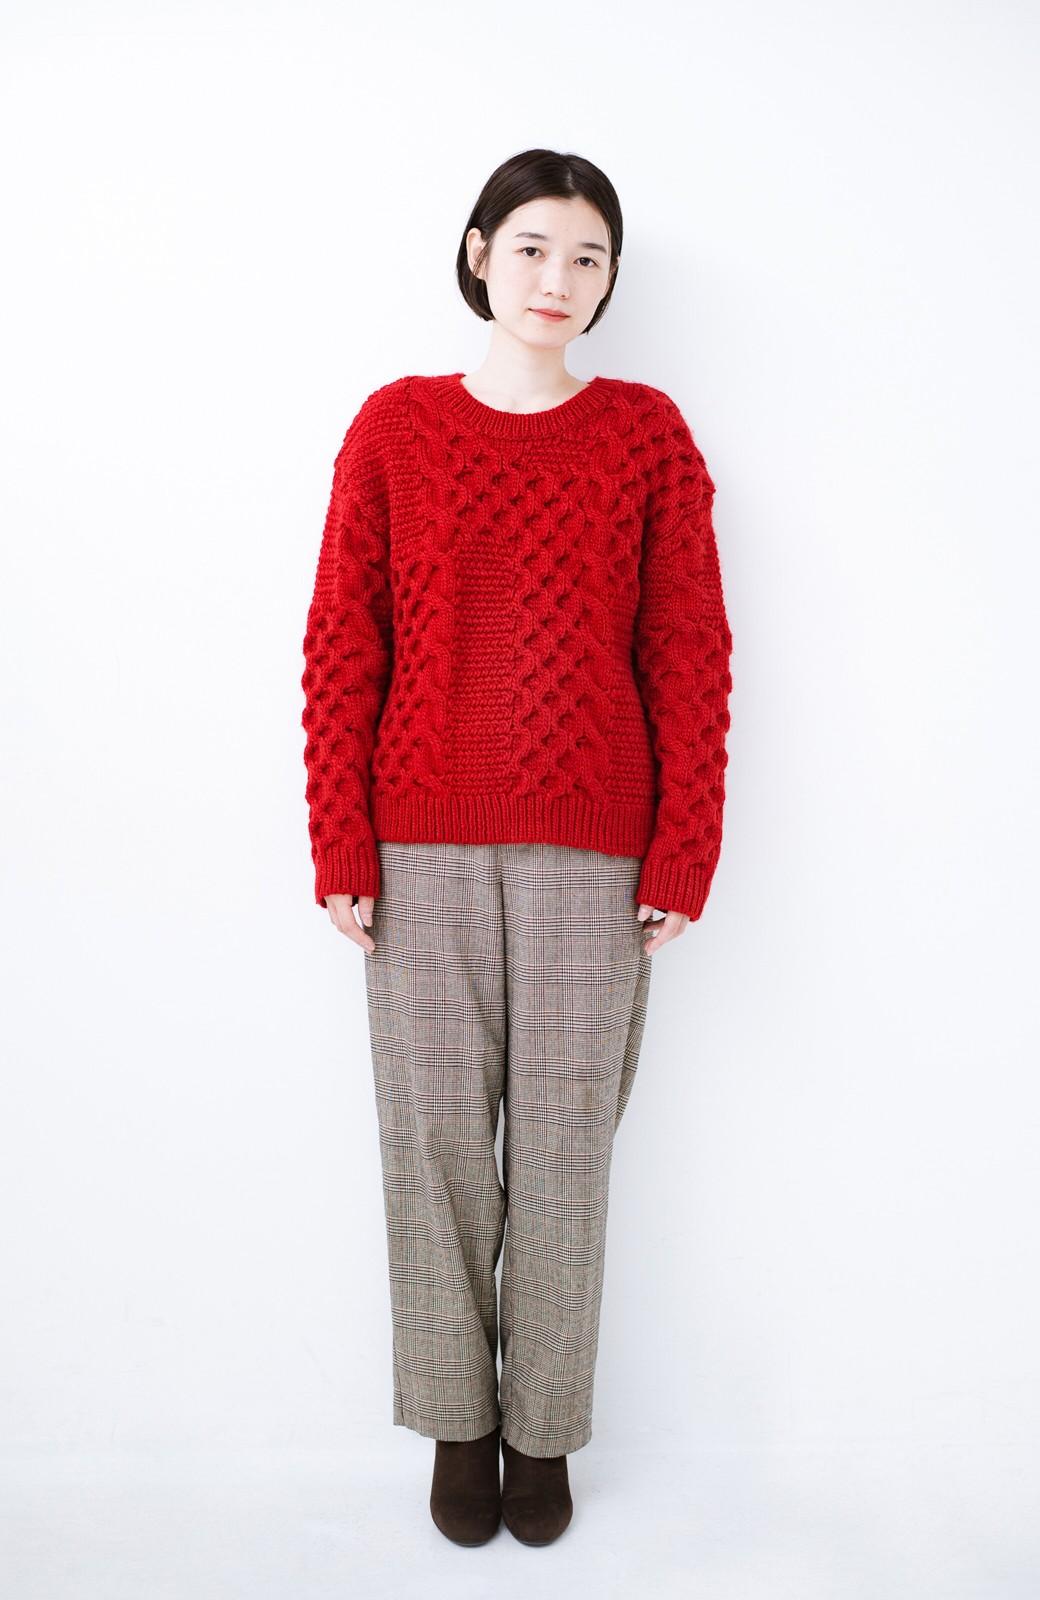 haco! 古着っぽい雰囲気がこなれたパネル編みケーブルニット <レッド>の商品写真6